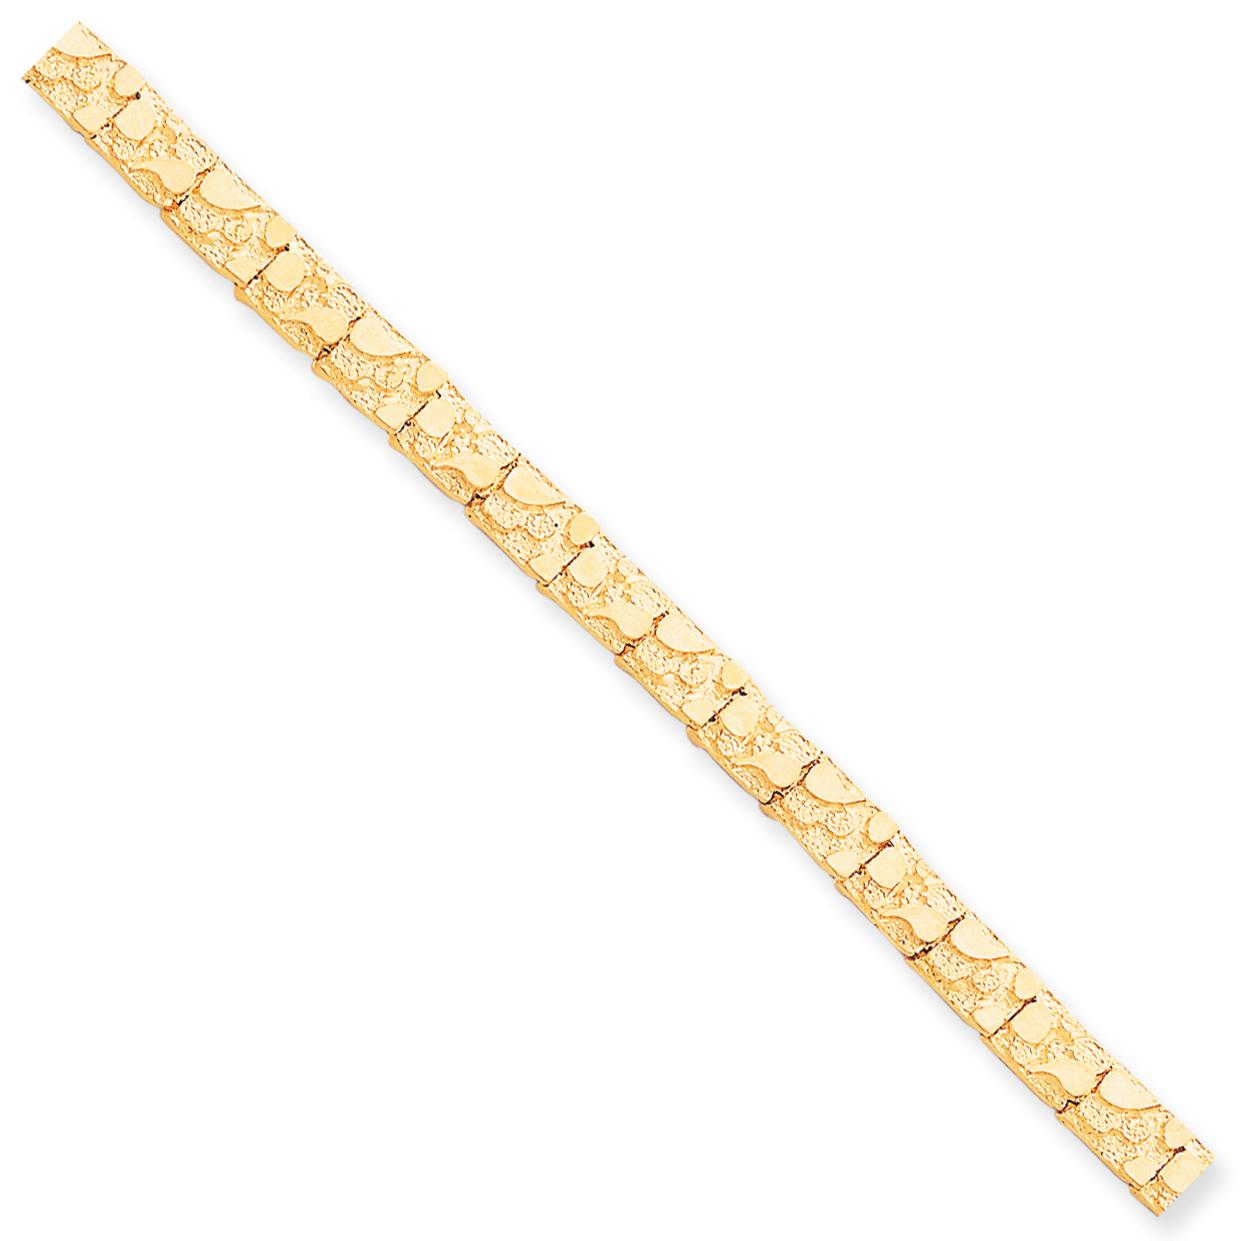 10k 7 Inch 6.0mm NUGGET Bracelet